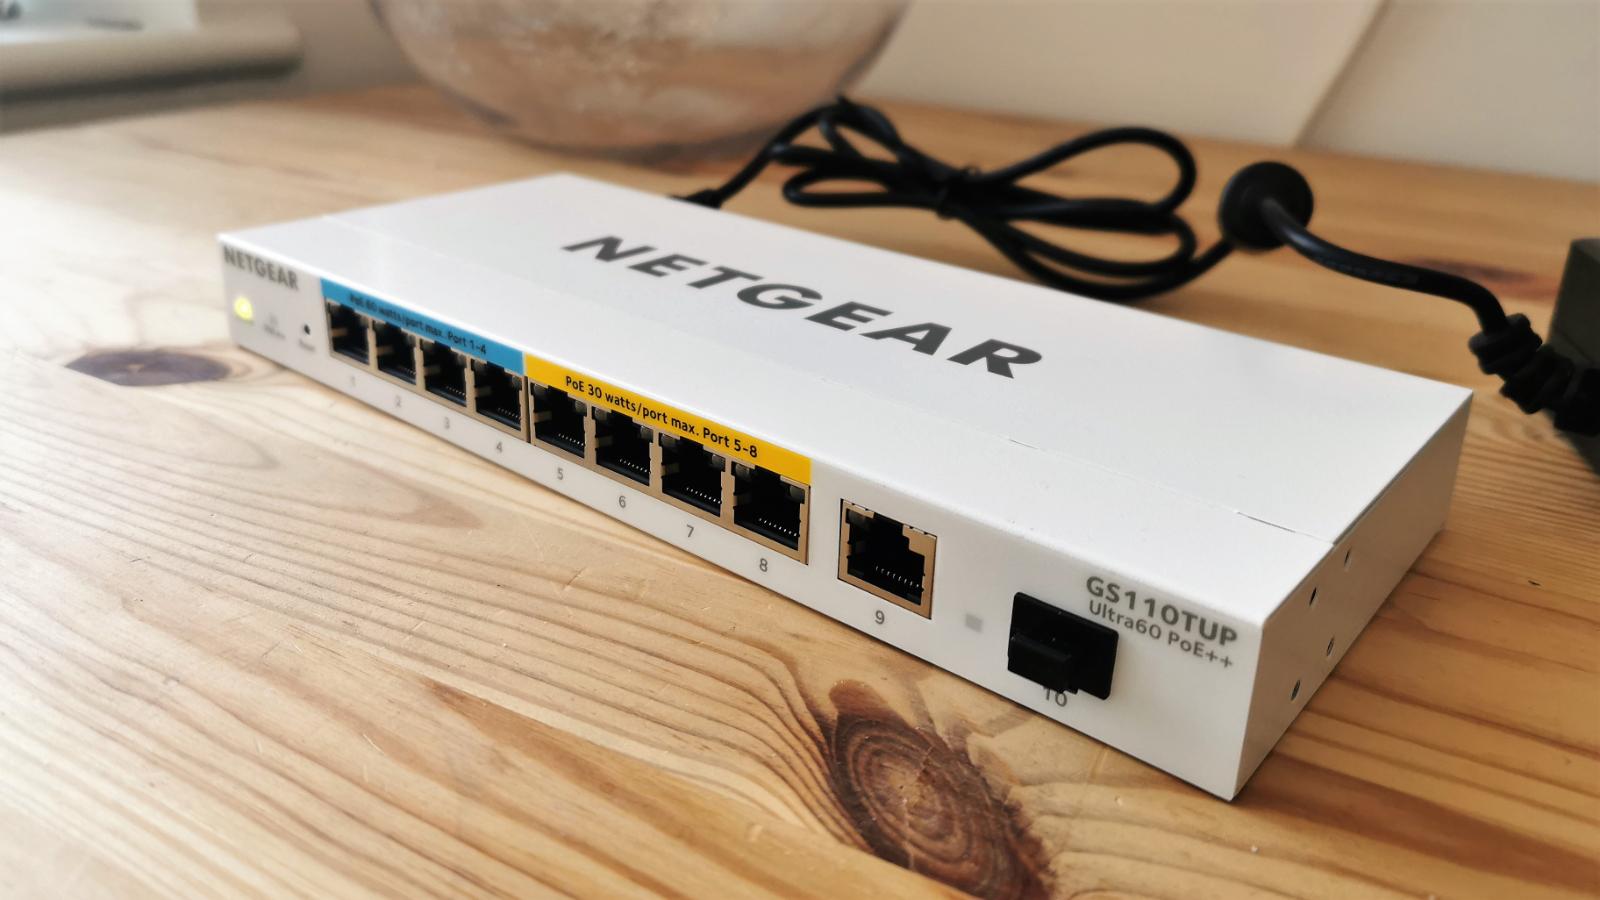 Netgear GS119TUP PoE+ Managed Switch